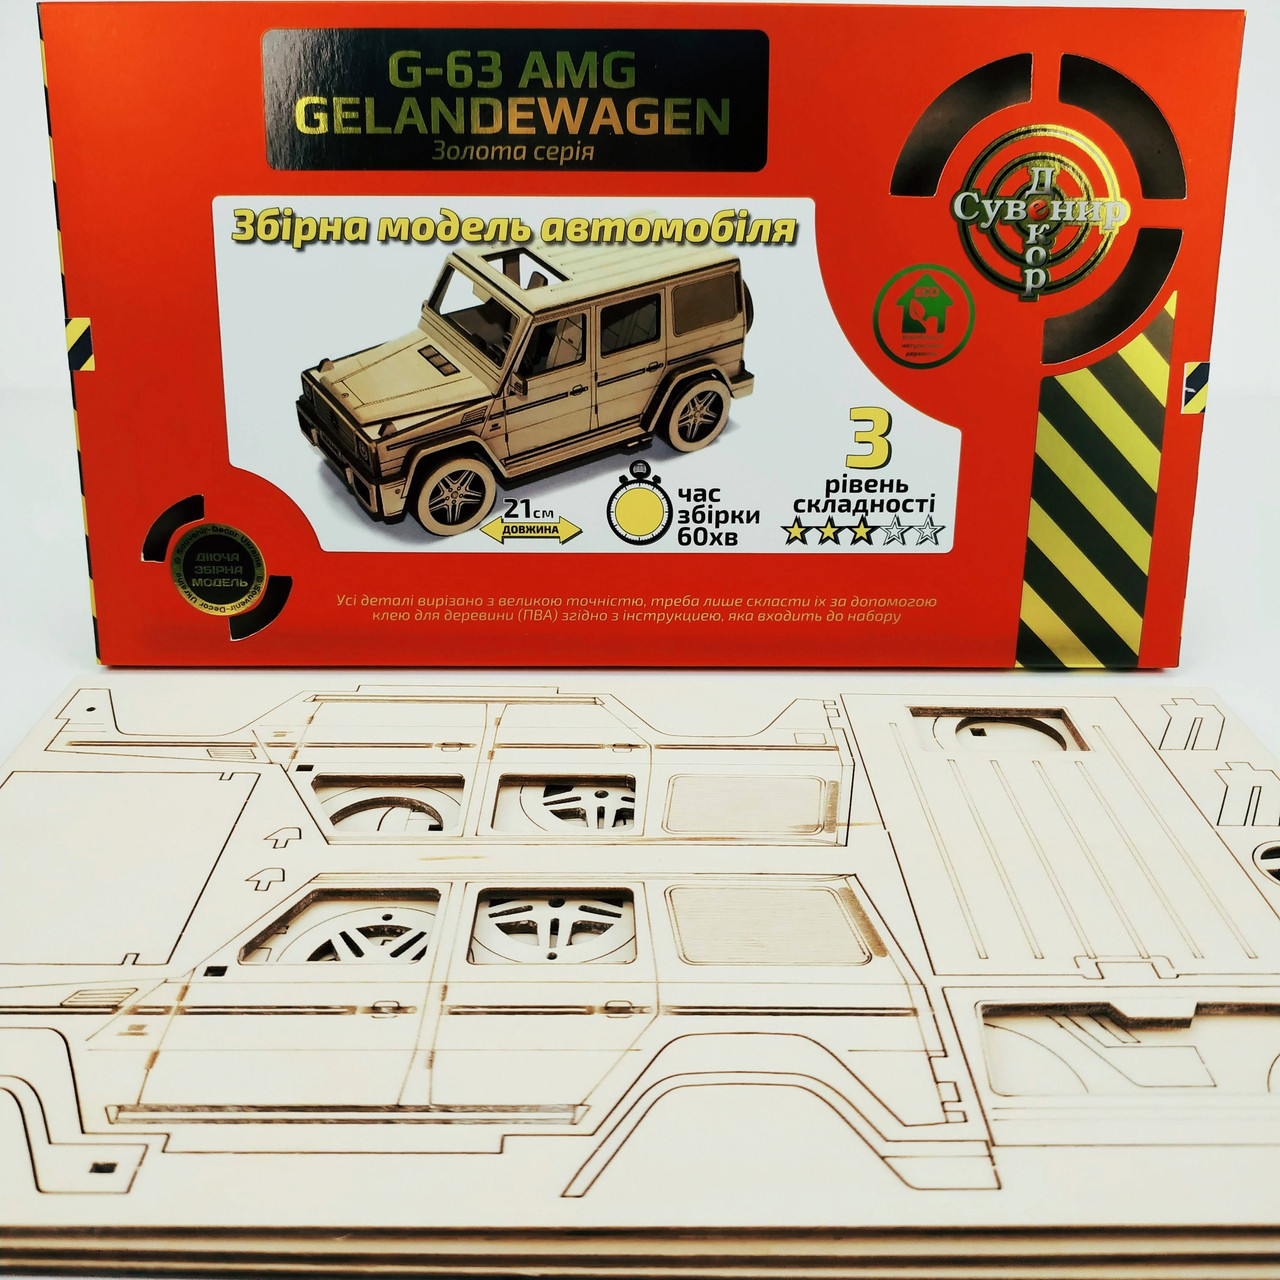 Конструктор автомобіль AMG G-63 Gelandewagen золота серія